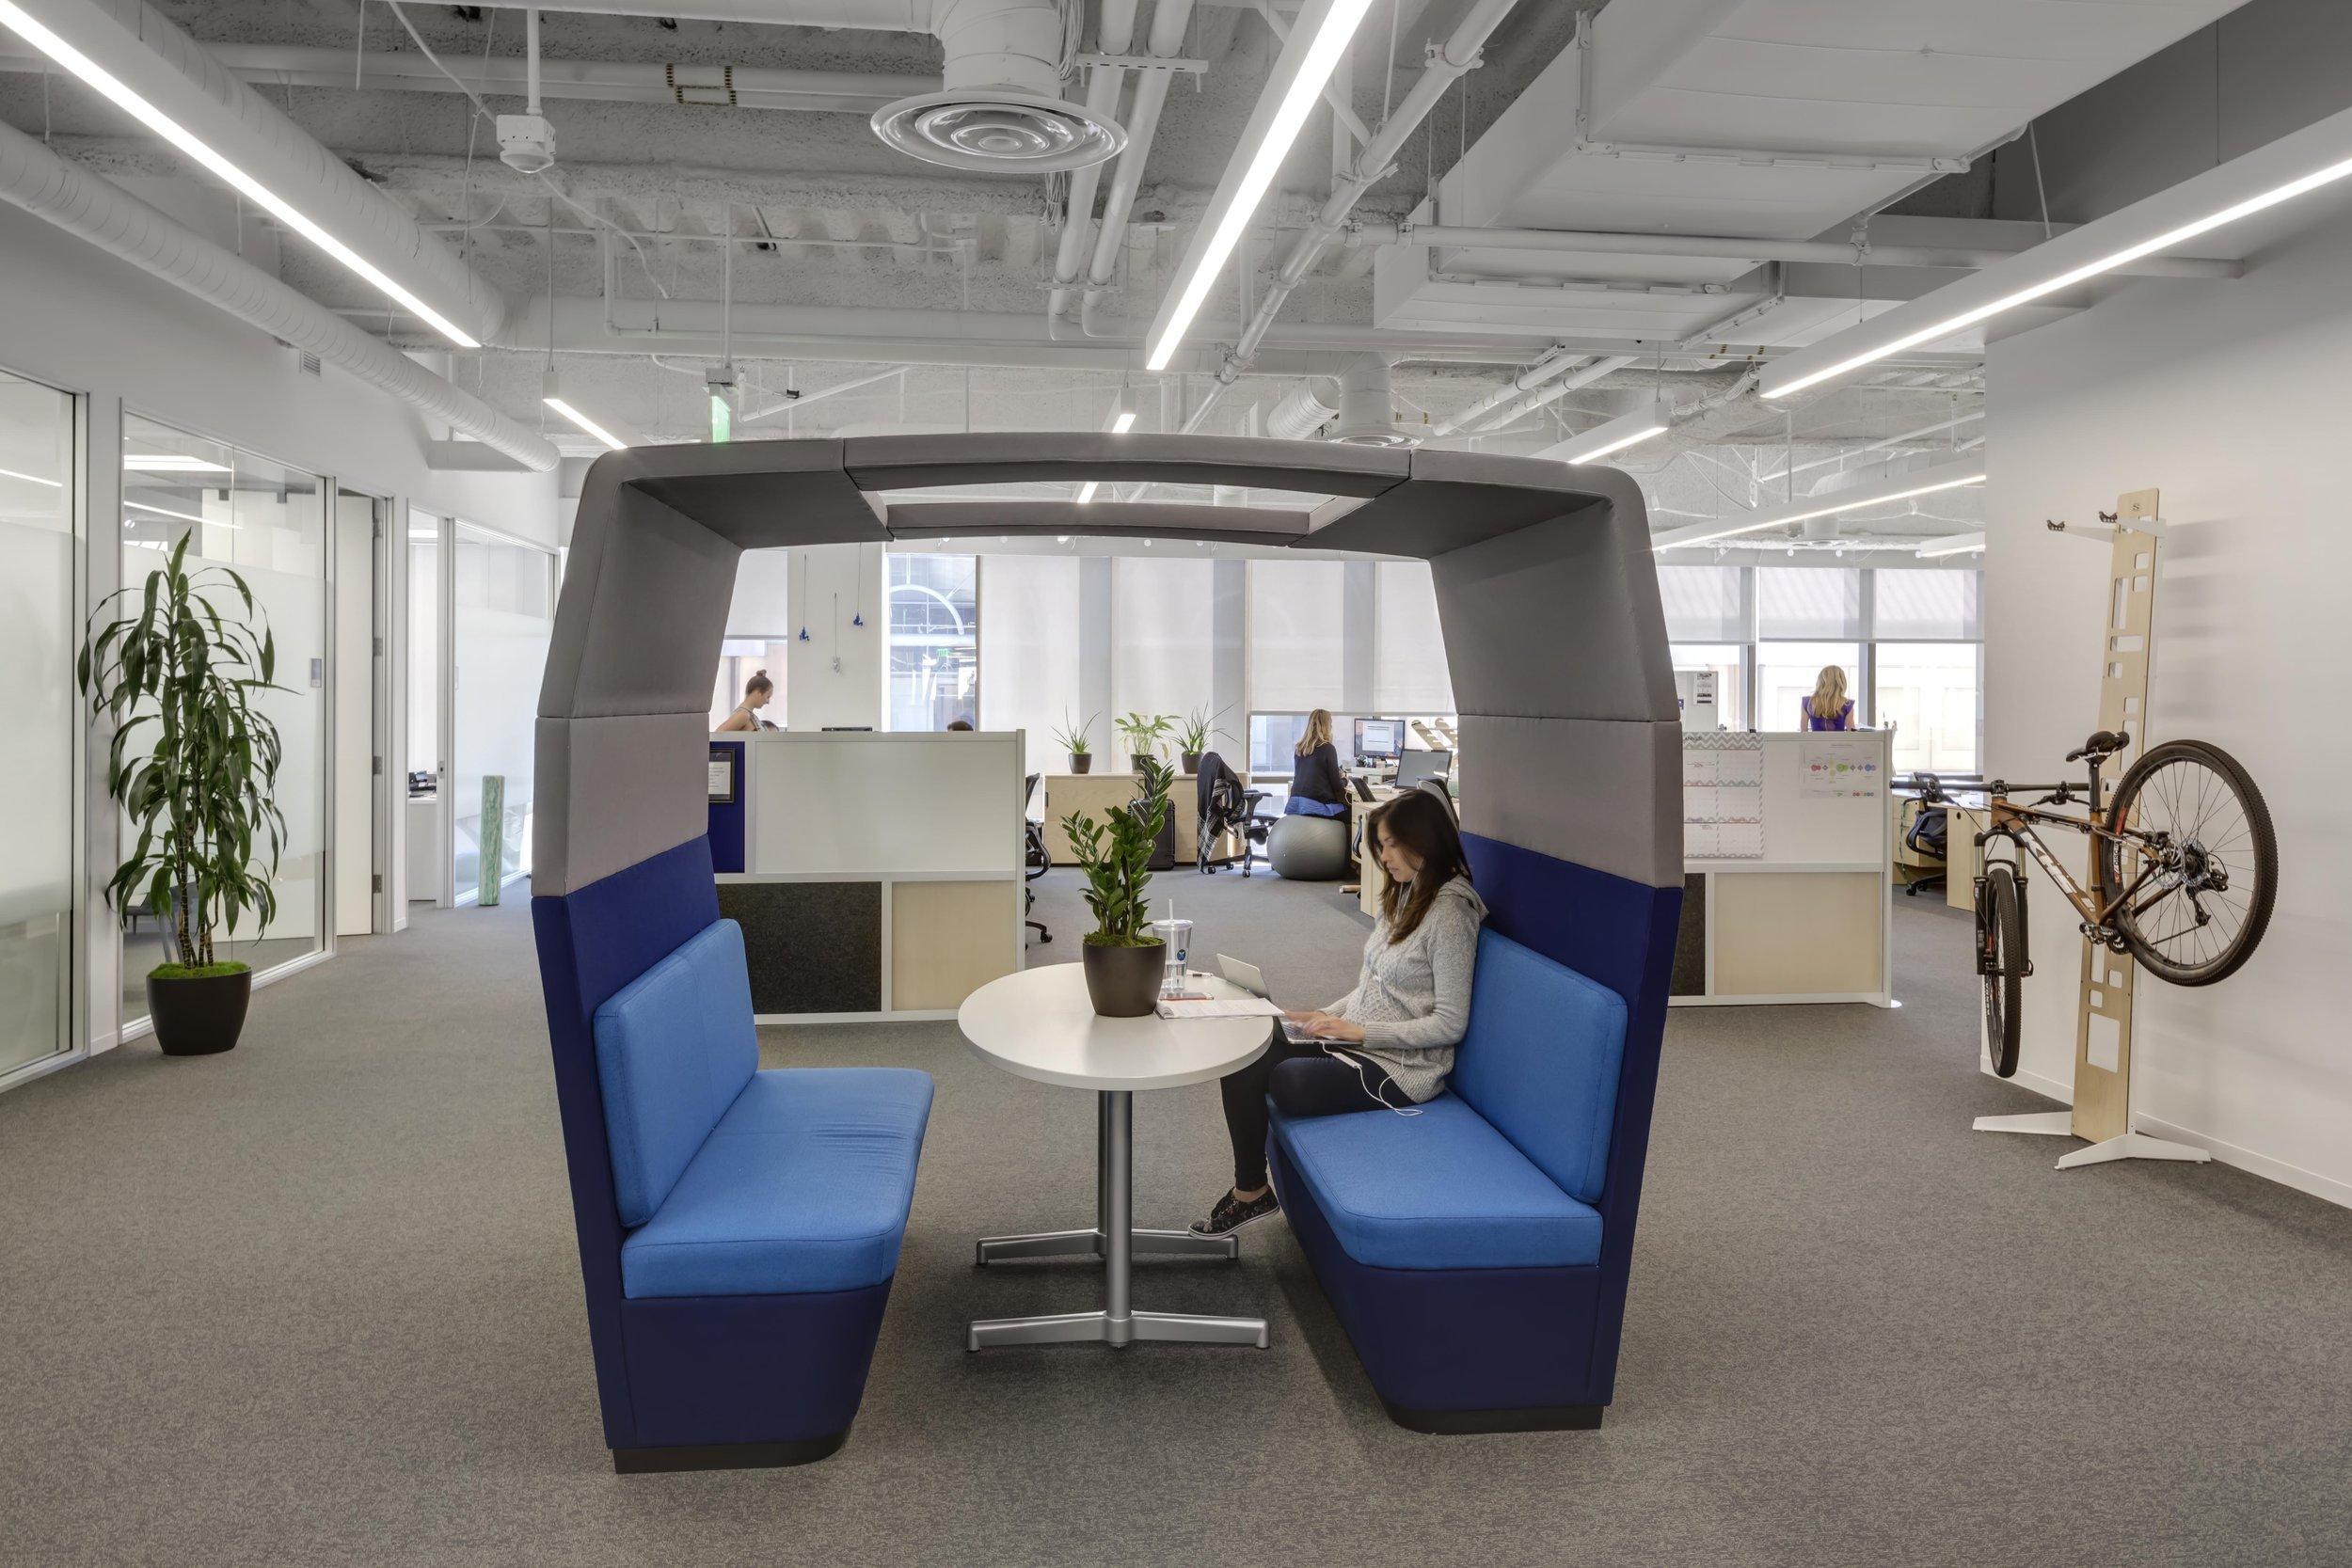 New Office_4.jpg